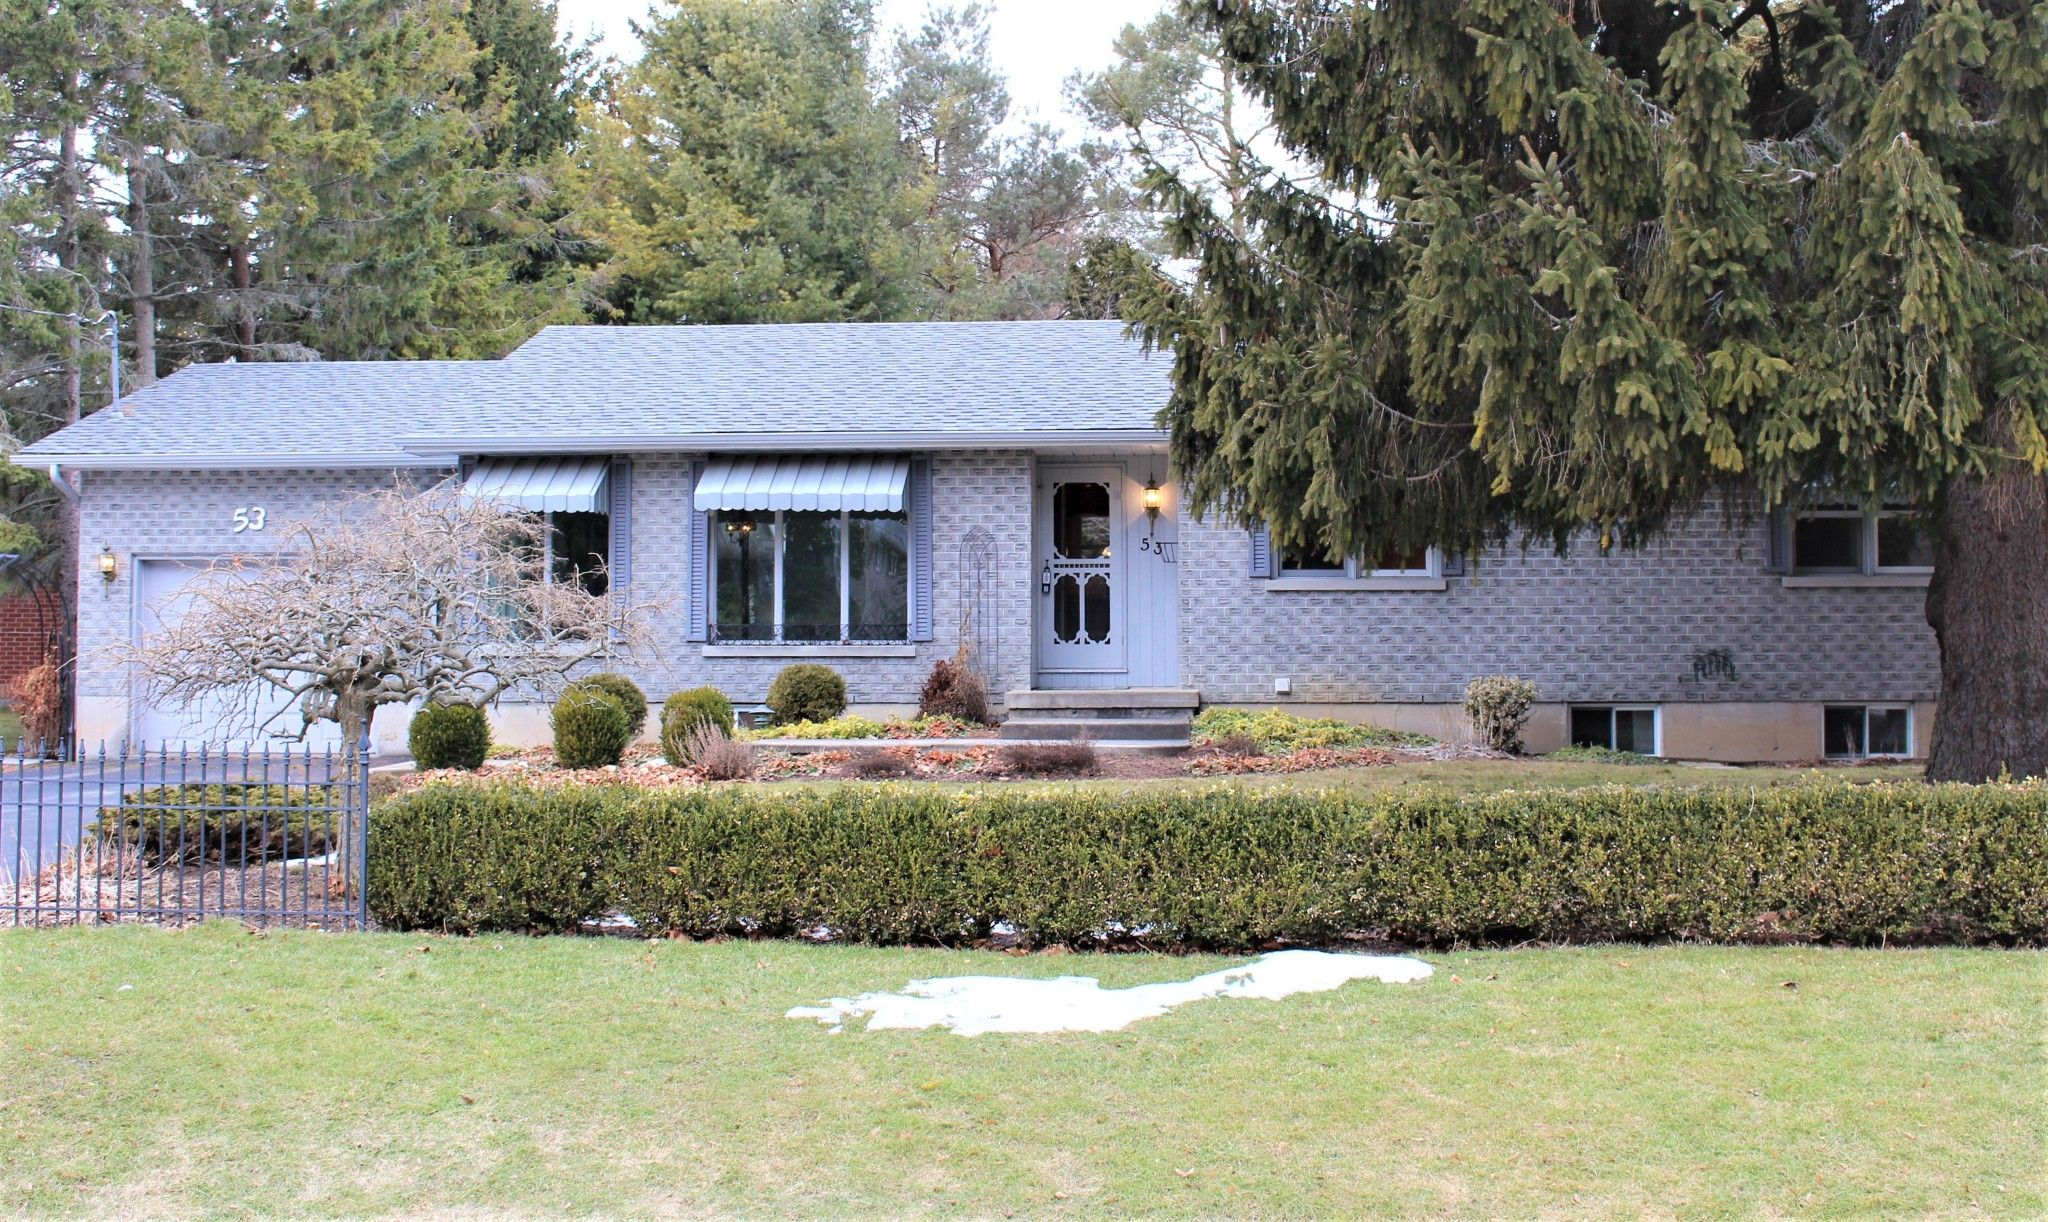 Main Photo: 53 Hamilton Avenue in Cobourg: House for sale : MLS®# 248535